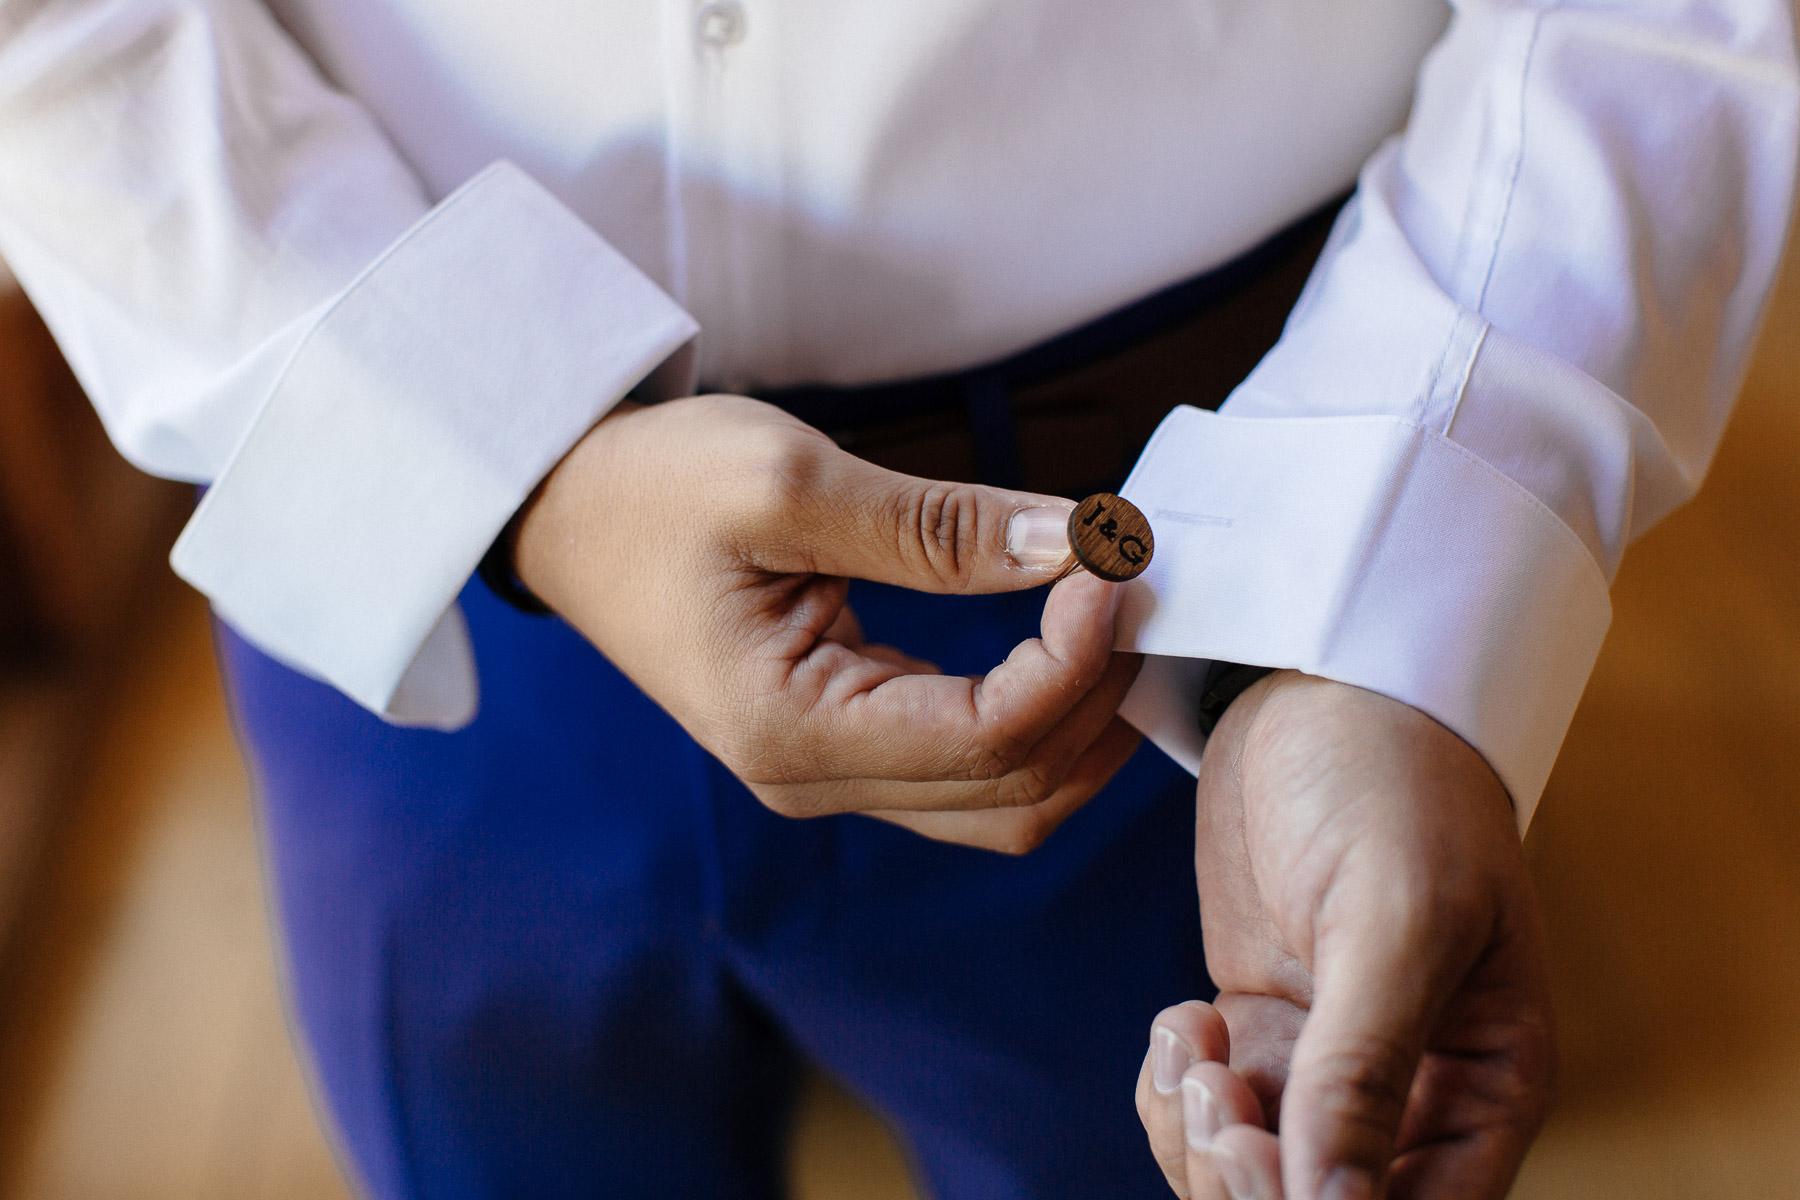 161029-Luxium-Weddings-Arizona-Jeff-Griselda-First-Look-Val-Vista-Lakes-Gilber-012.jpg